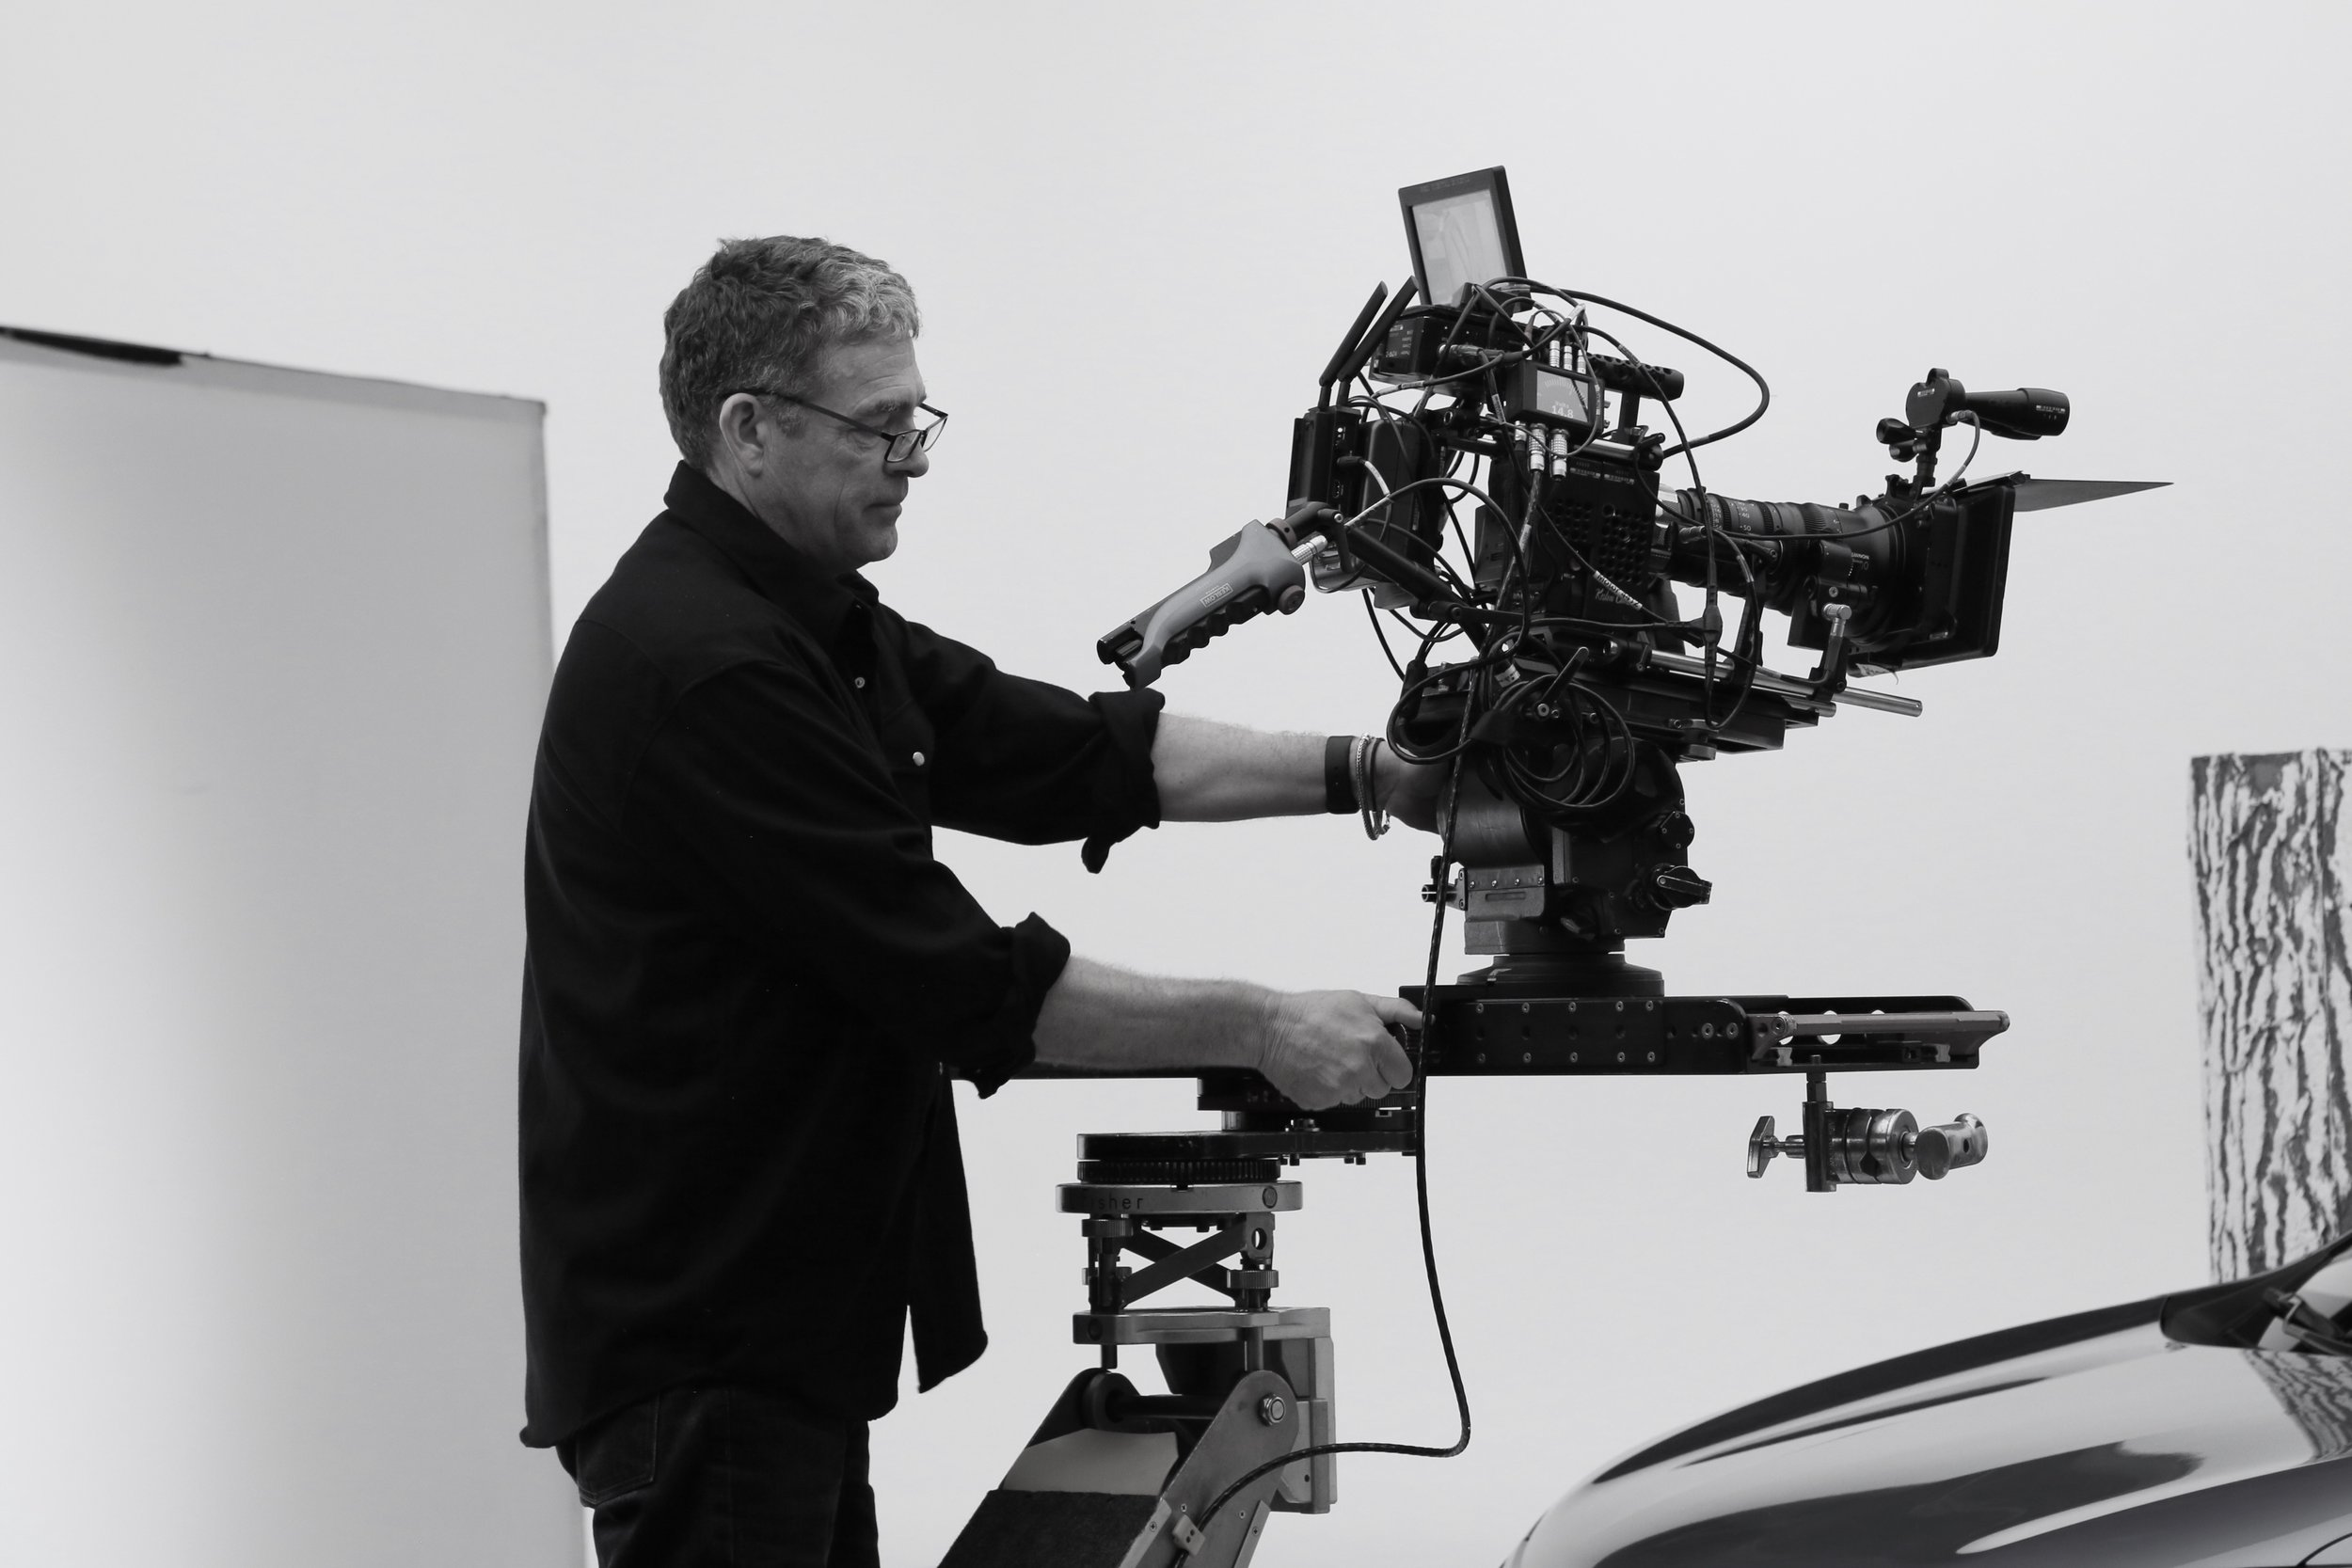 Kevin-Emmons-Cameraman.png